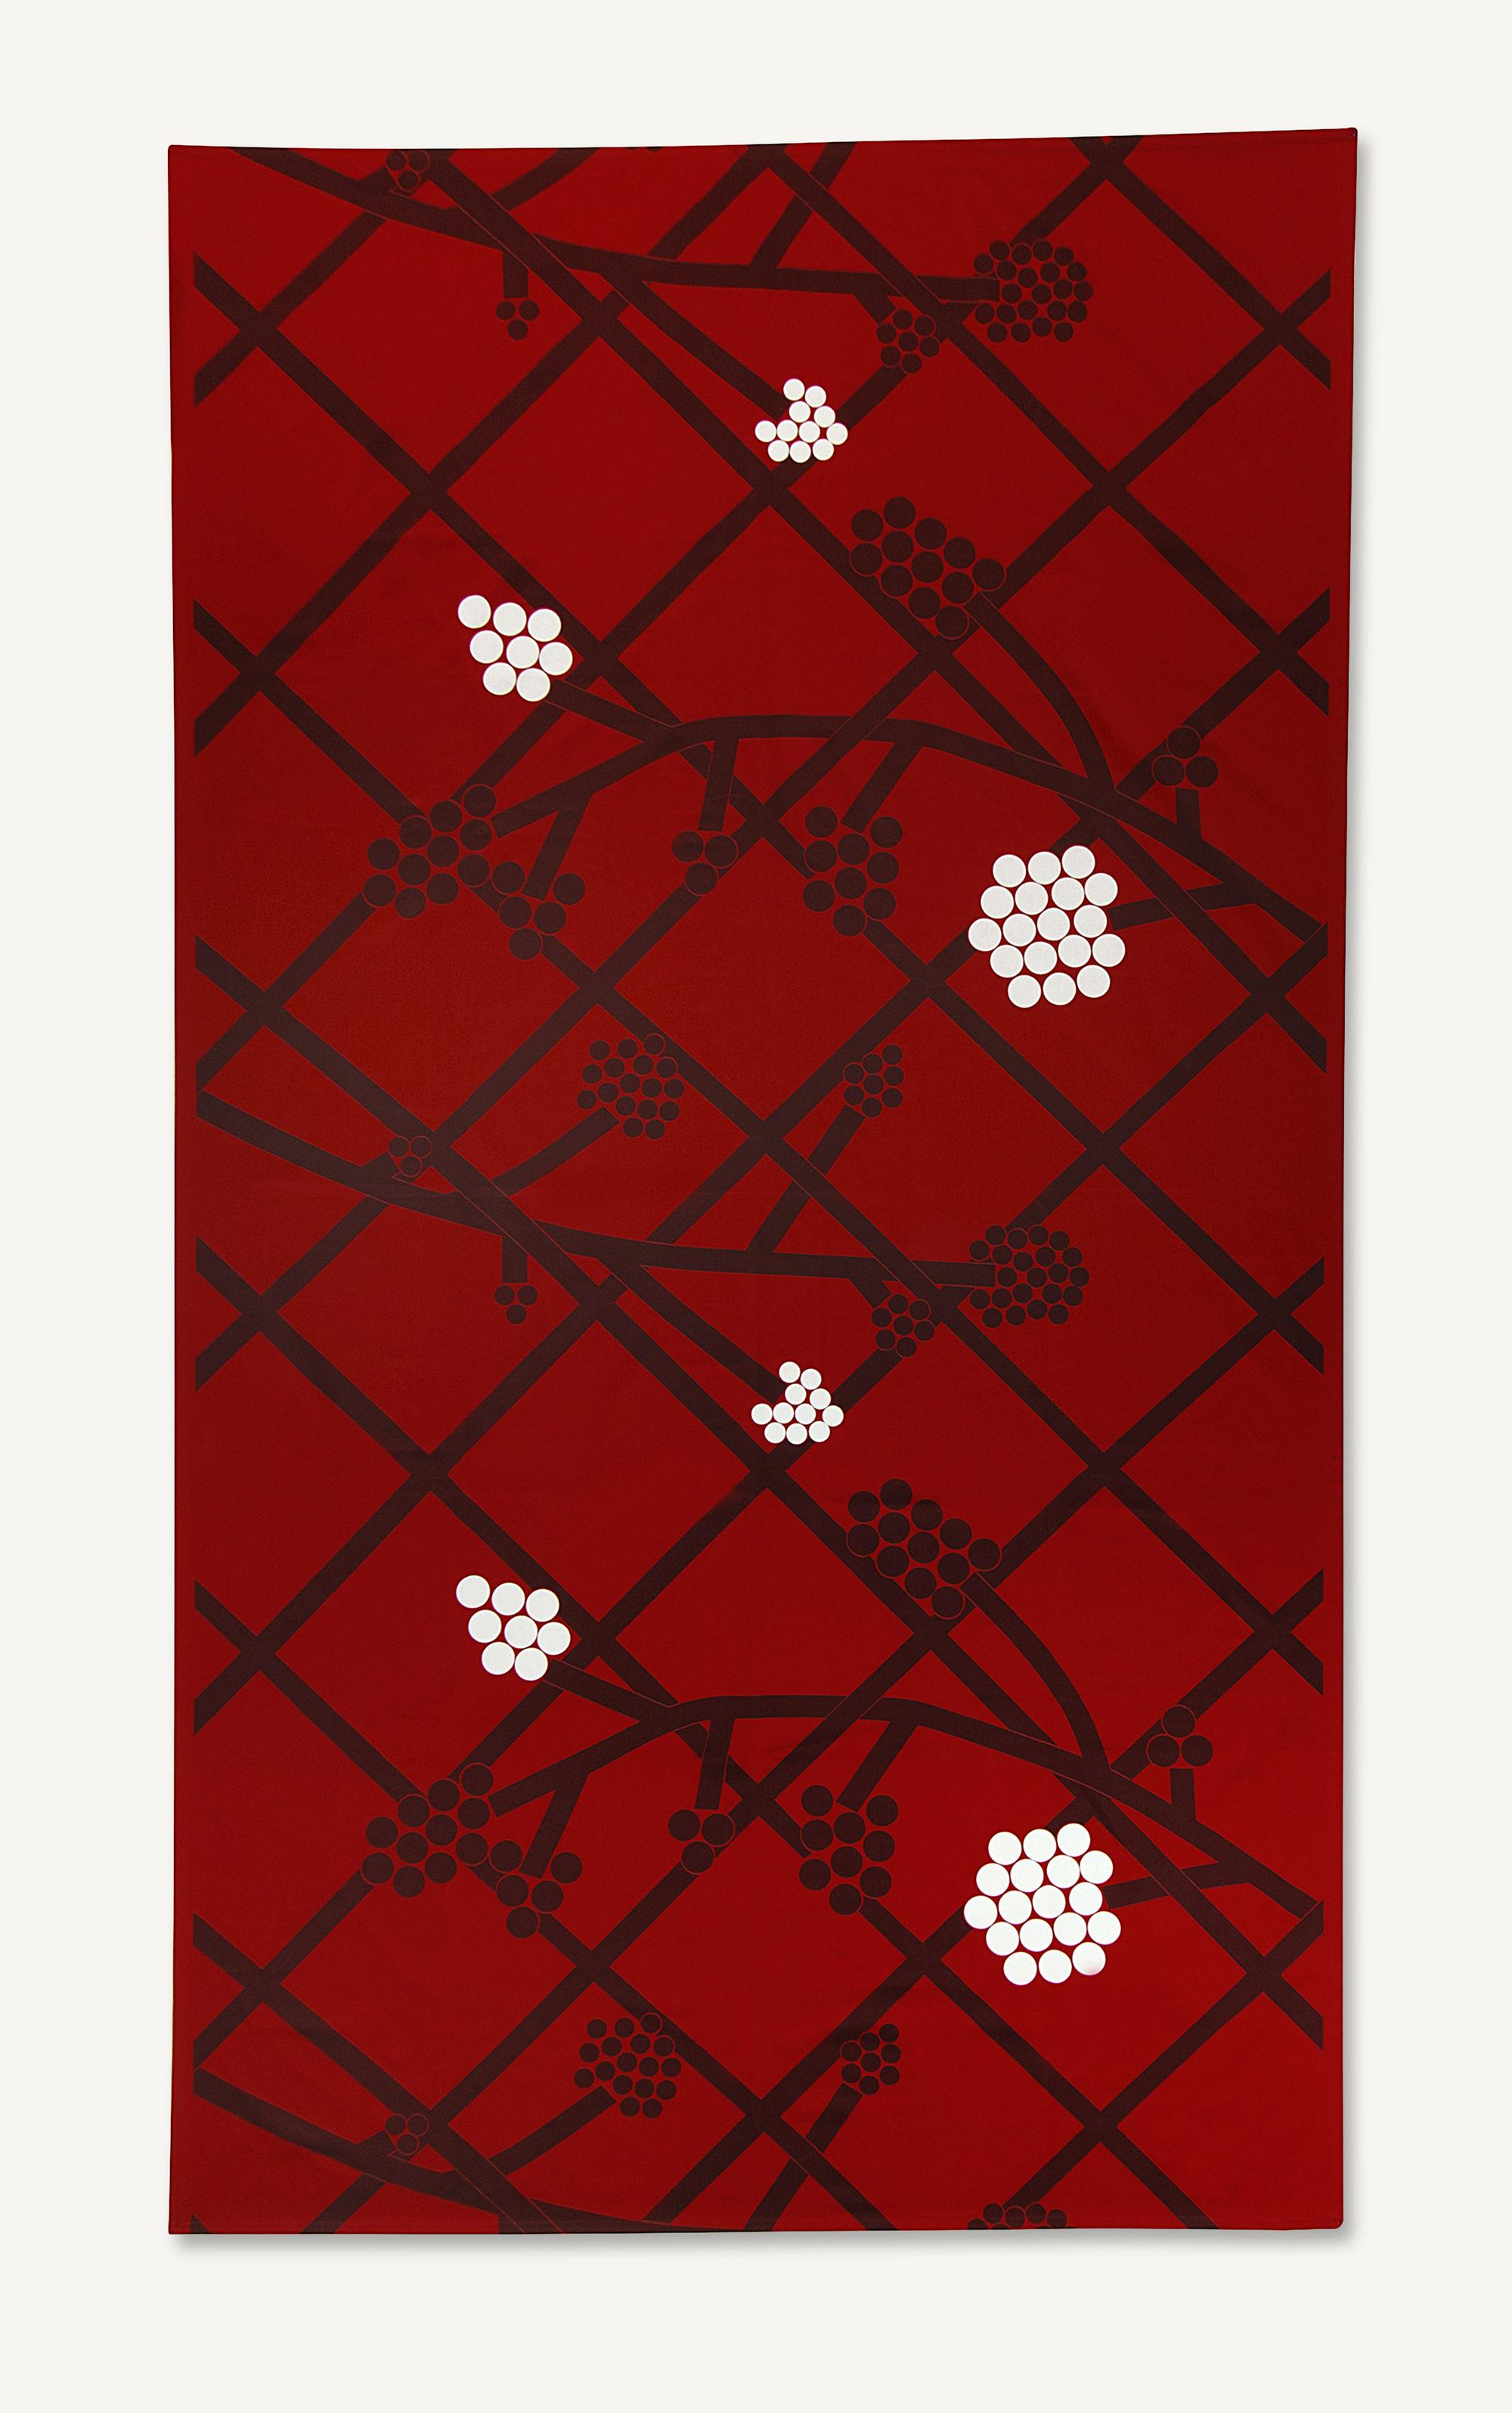 Hortensie Fabric Tablecloth 160 X 280 Cm Red By Marimekko